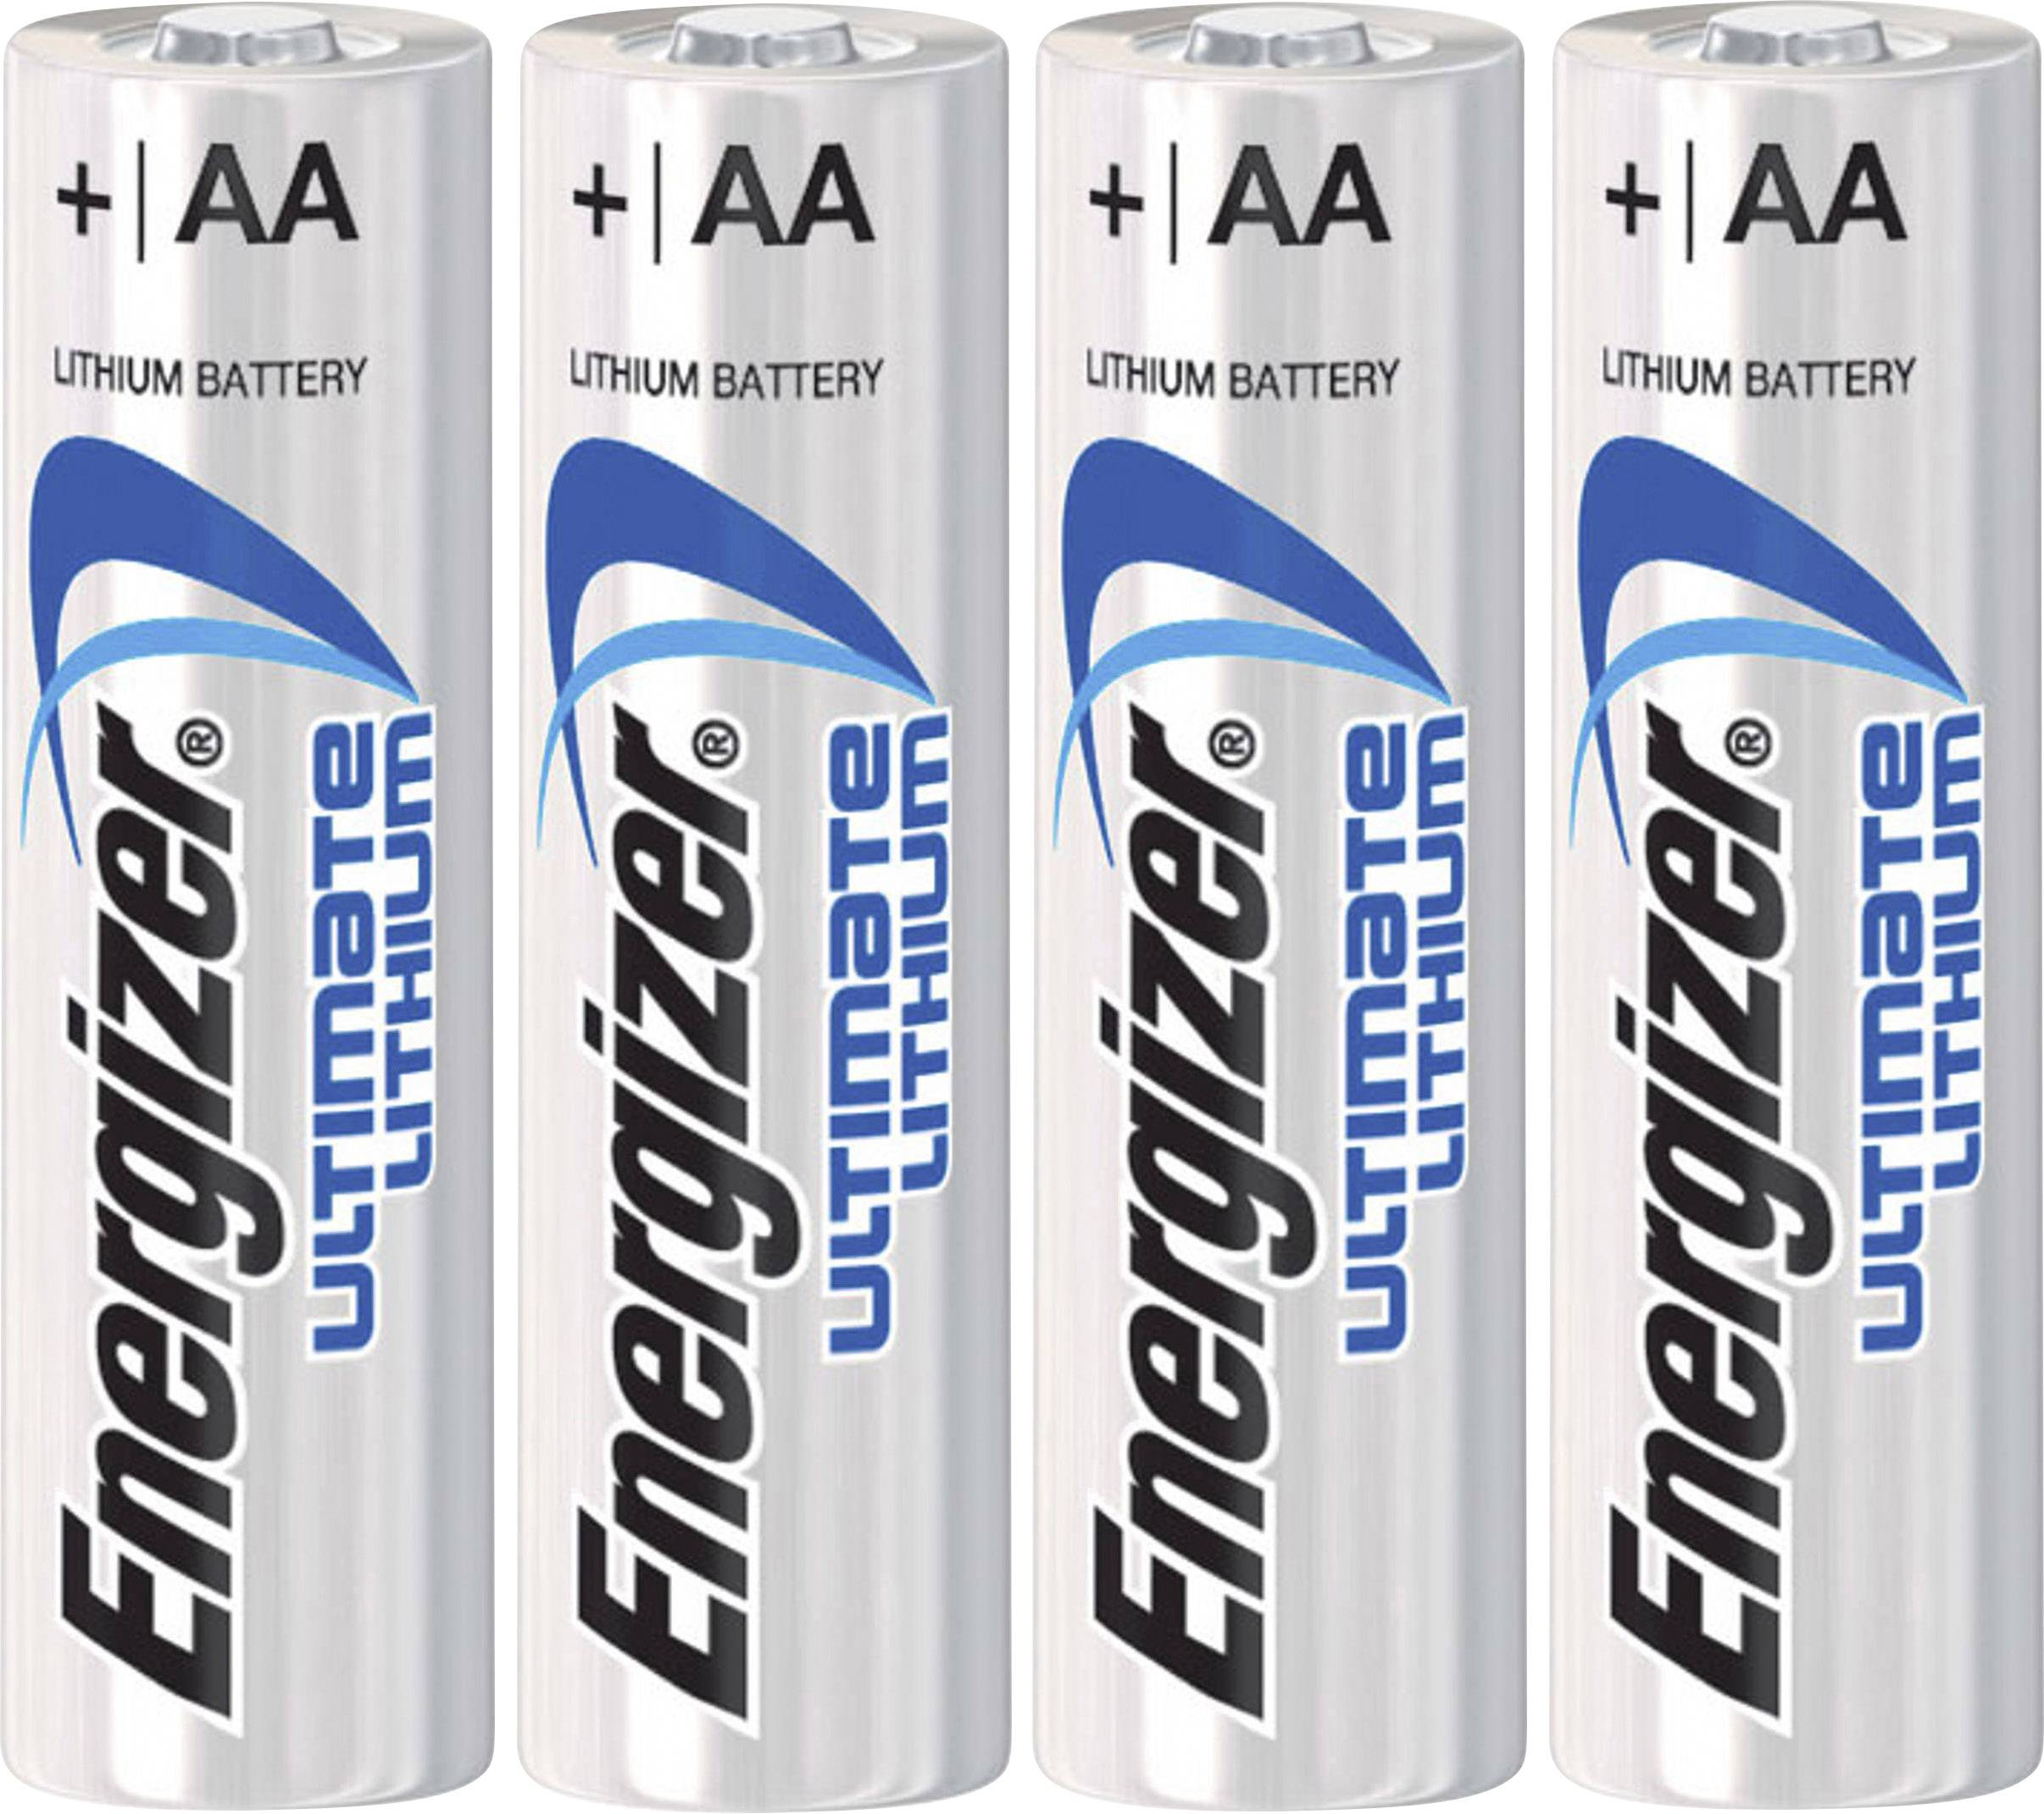 Tužková baterie AA Energizer Ultimate LR06, 3000 mAh, 1.5 V, 2 ks